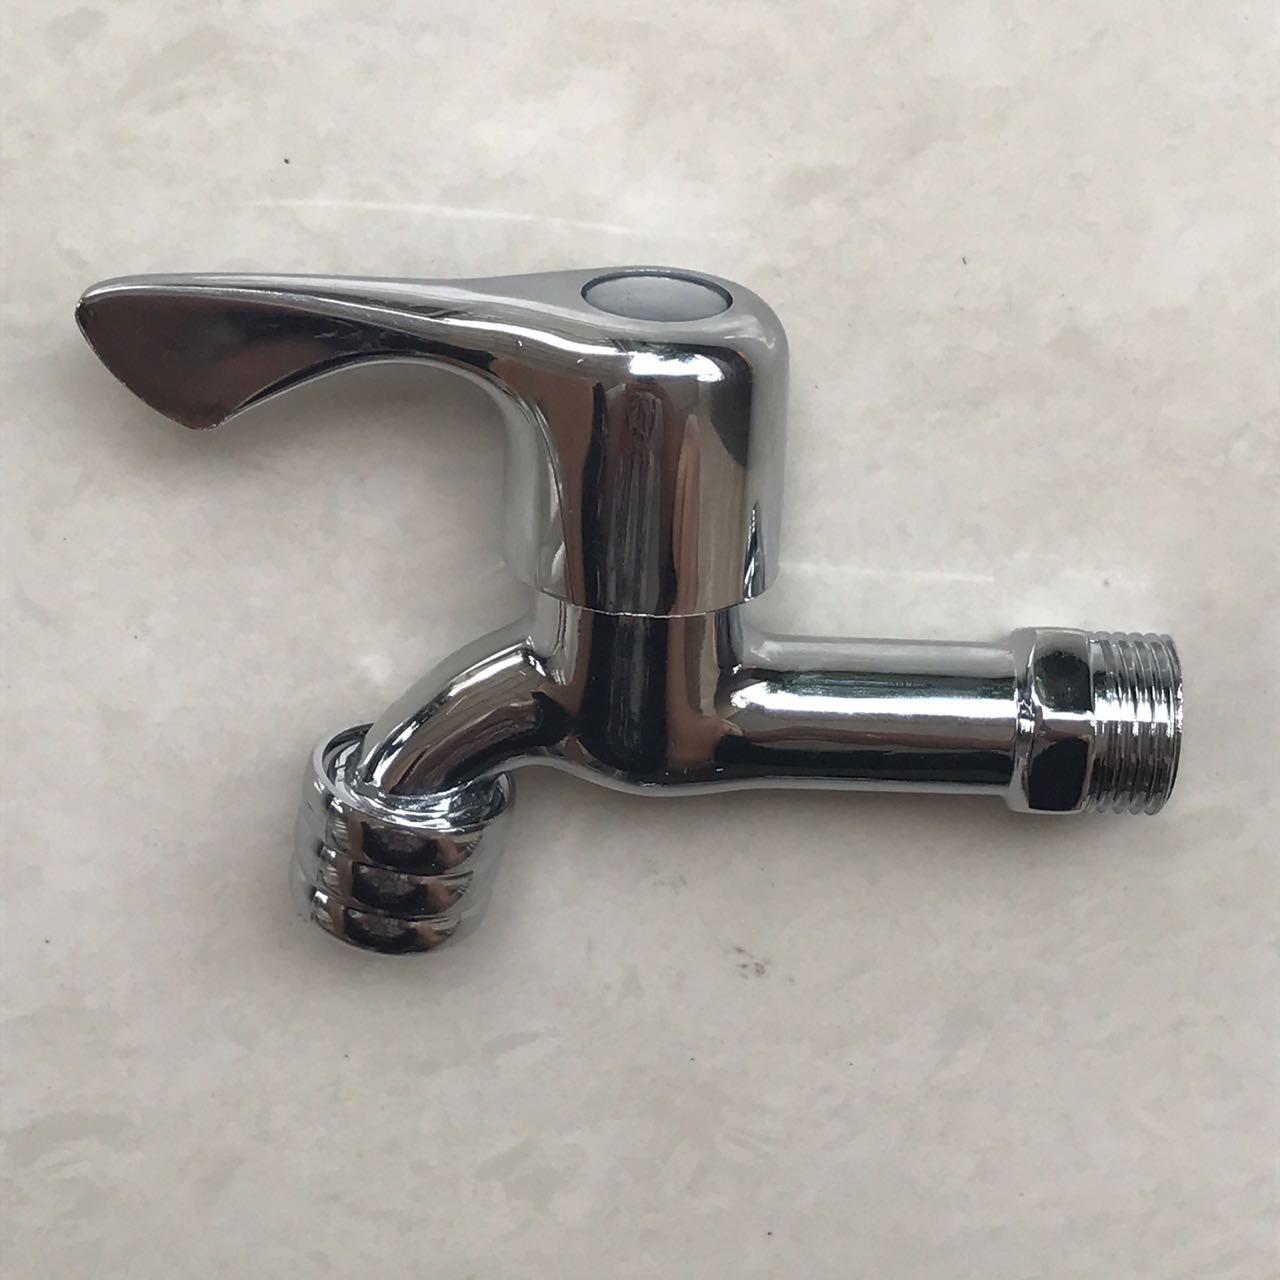 Jaya Kunci Amp Sanitary Menjual Aksesoris Pintu Dan